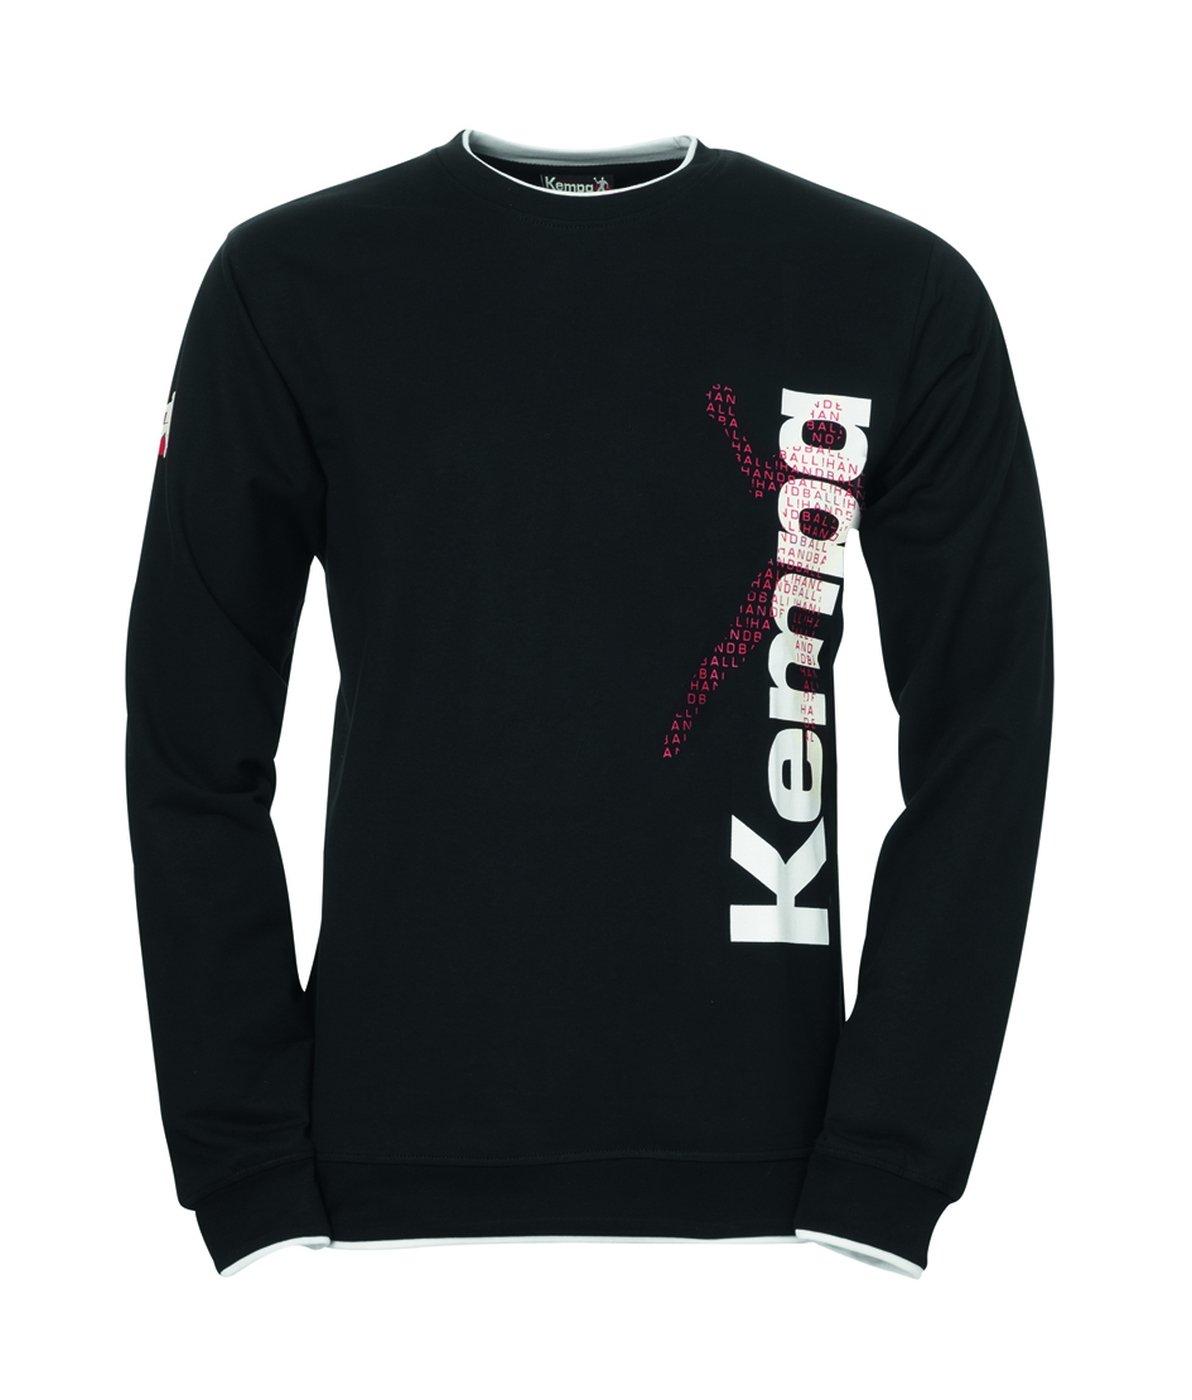 Kempa Player Training - Sudadera para hombre, tamaño XXS, color negro 200206201